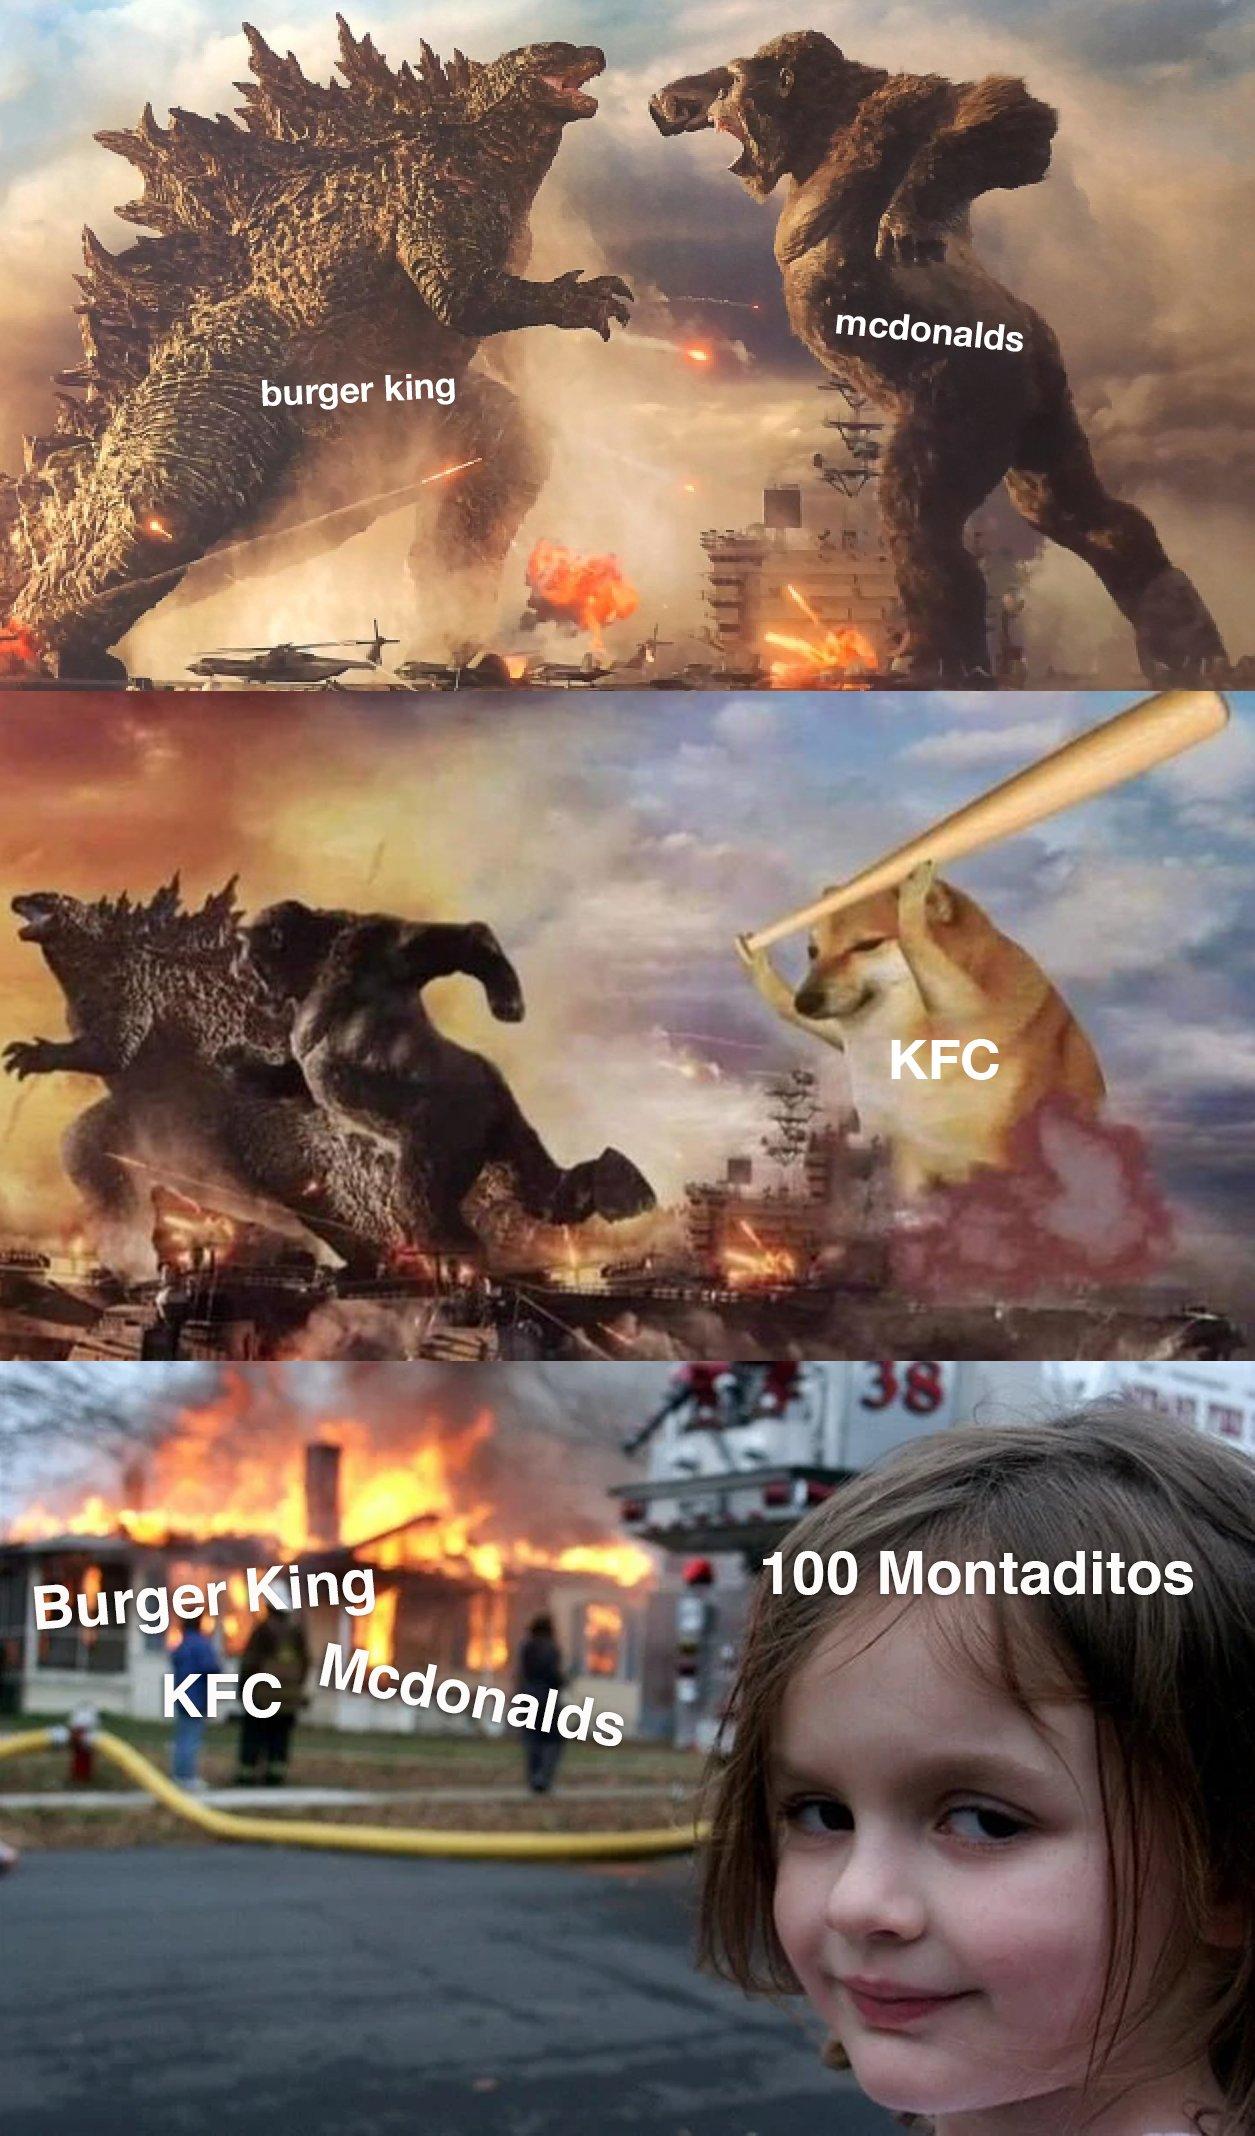 KFC Burger King kapışması